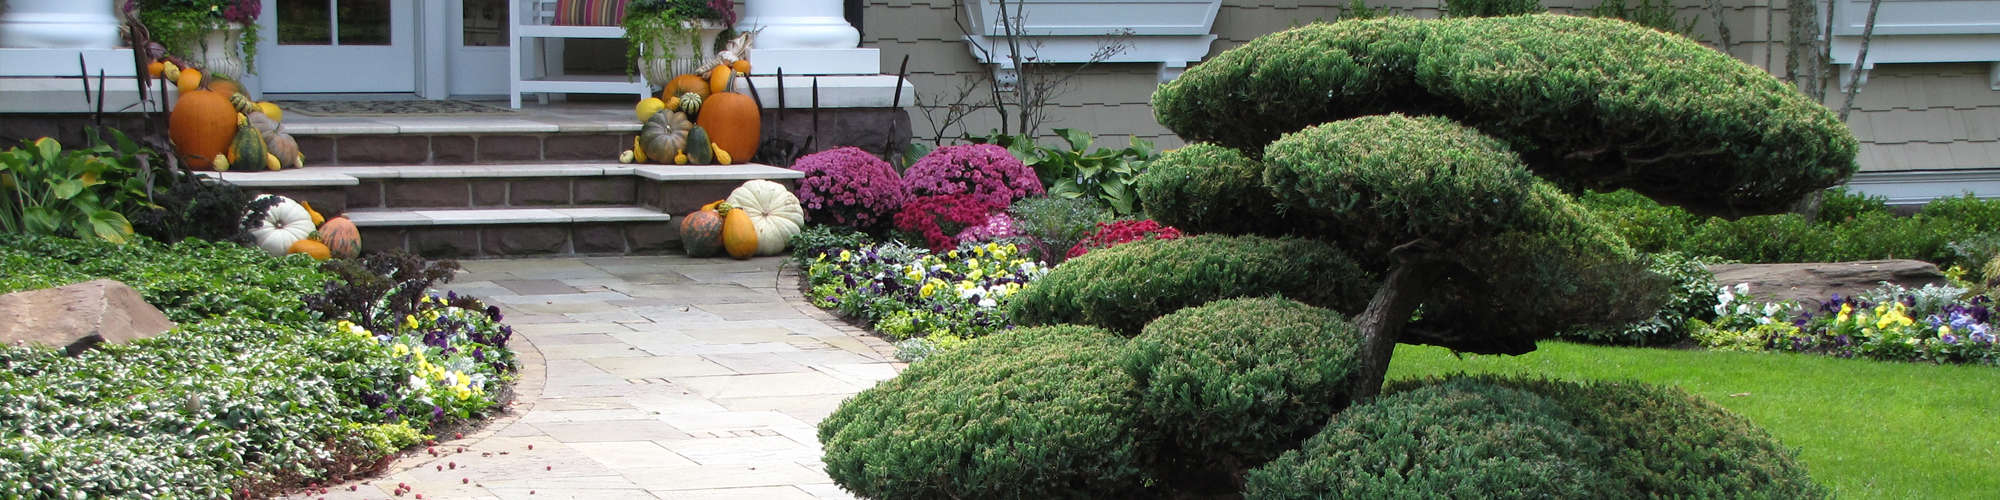 Specialized Pruning - Windscapes Landscaping - Landscape Design Grand Rapids MI